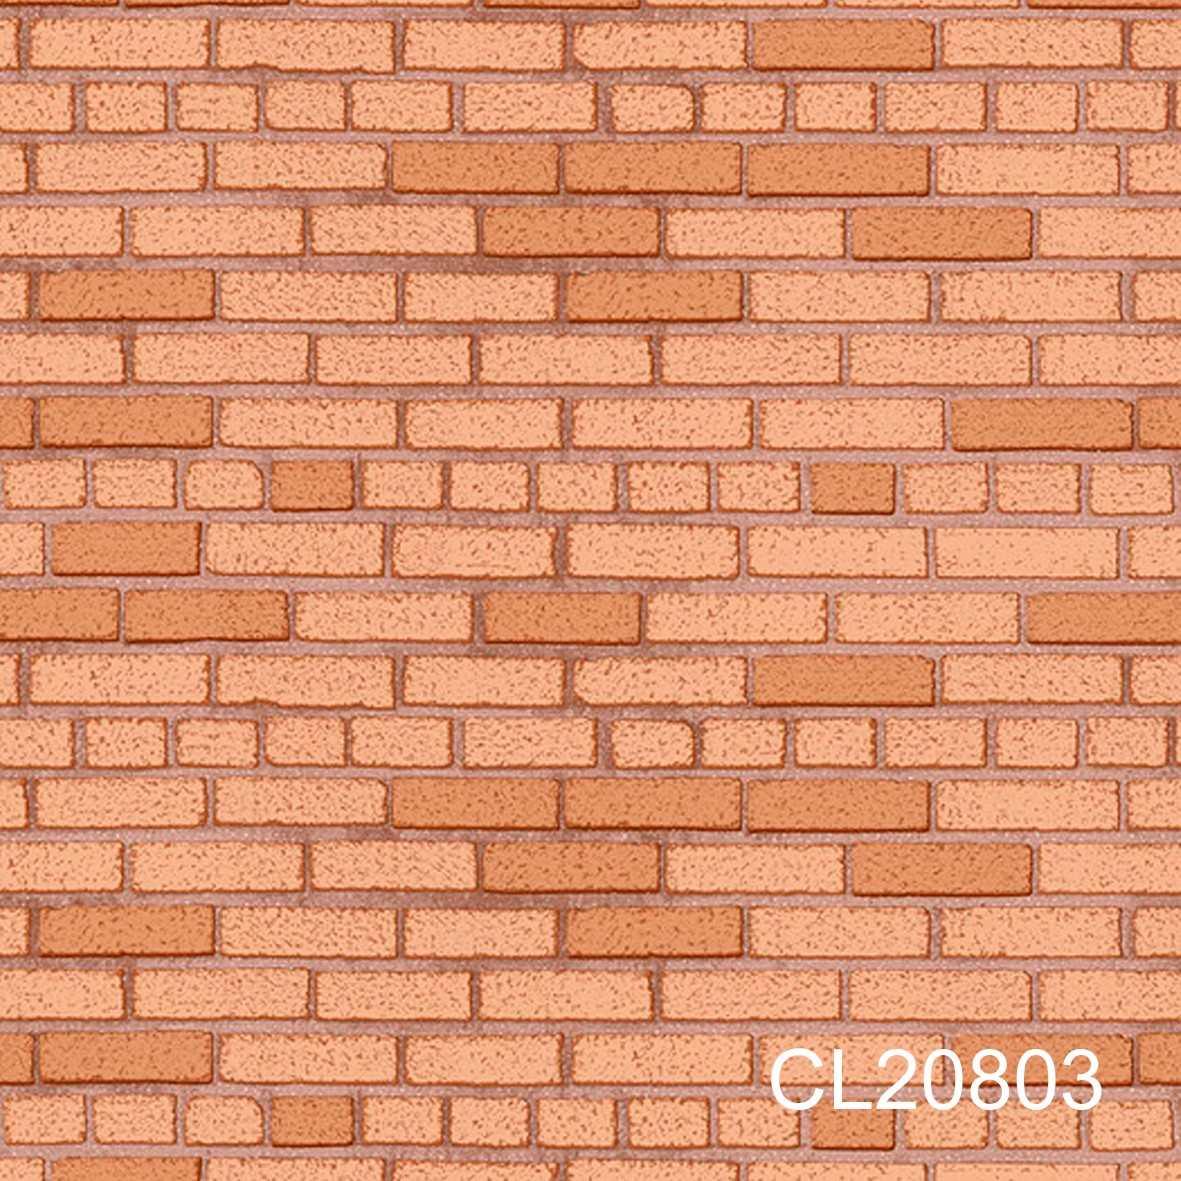 Papel de parede tijolos premium luxo vinilico lavavel 10m for Papel para paredes catalogo